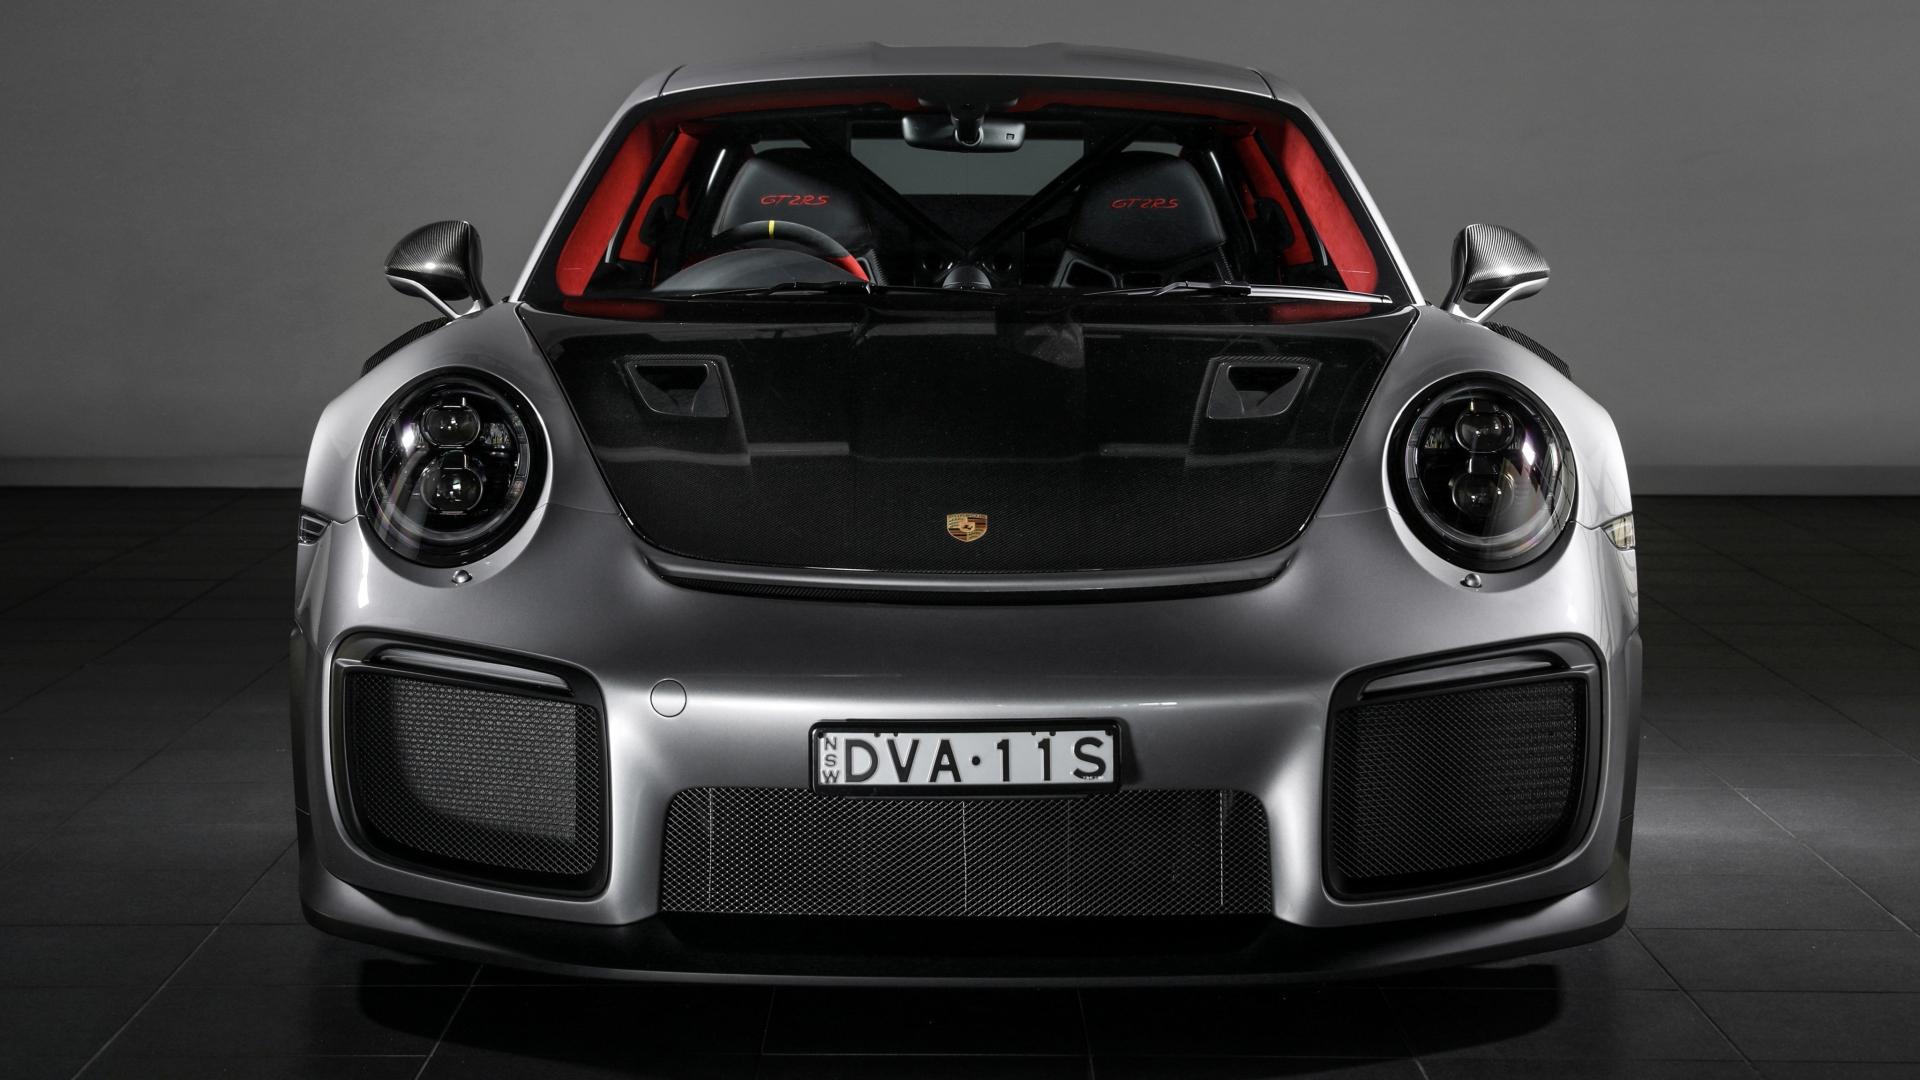 Download 1920x1080 Wallpaper 2018 Porsche 911 Gt3 Rs Sports Car Full Hd Hdtv Fhd 1080p 1920x1080 Hd Image Background 5666